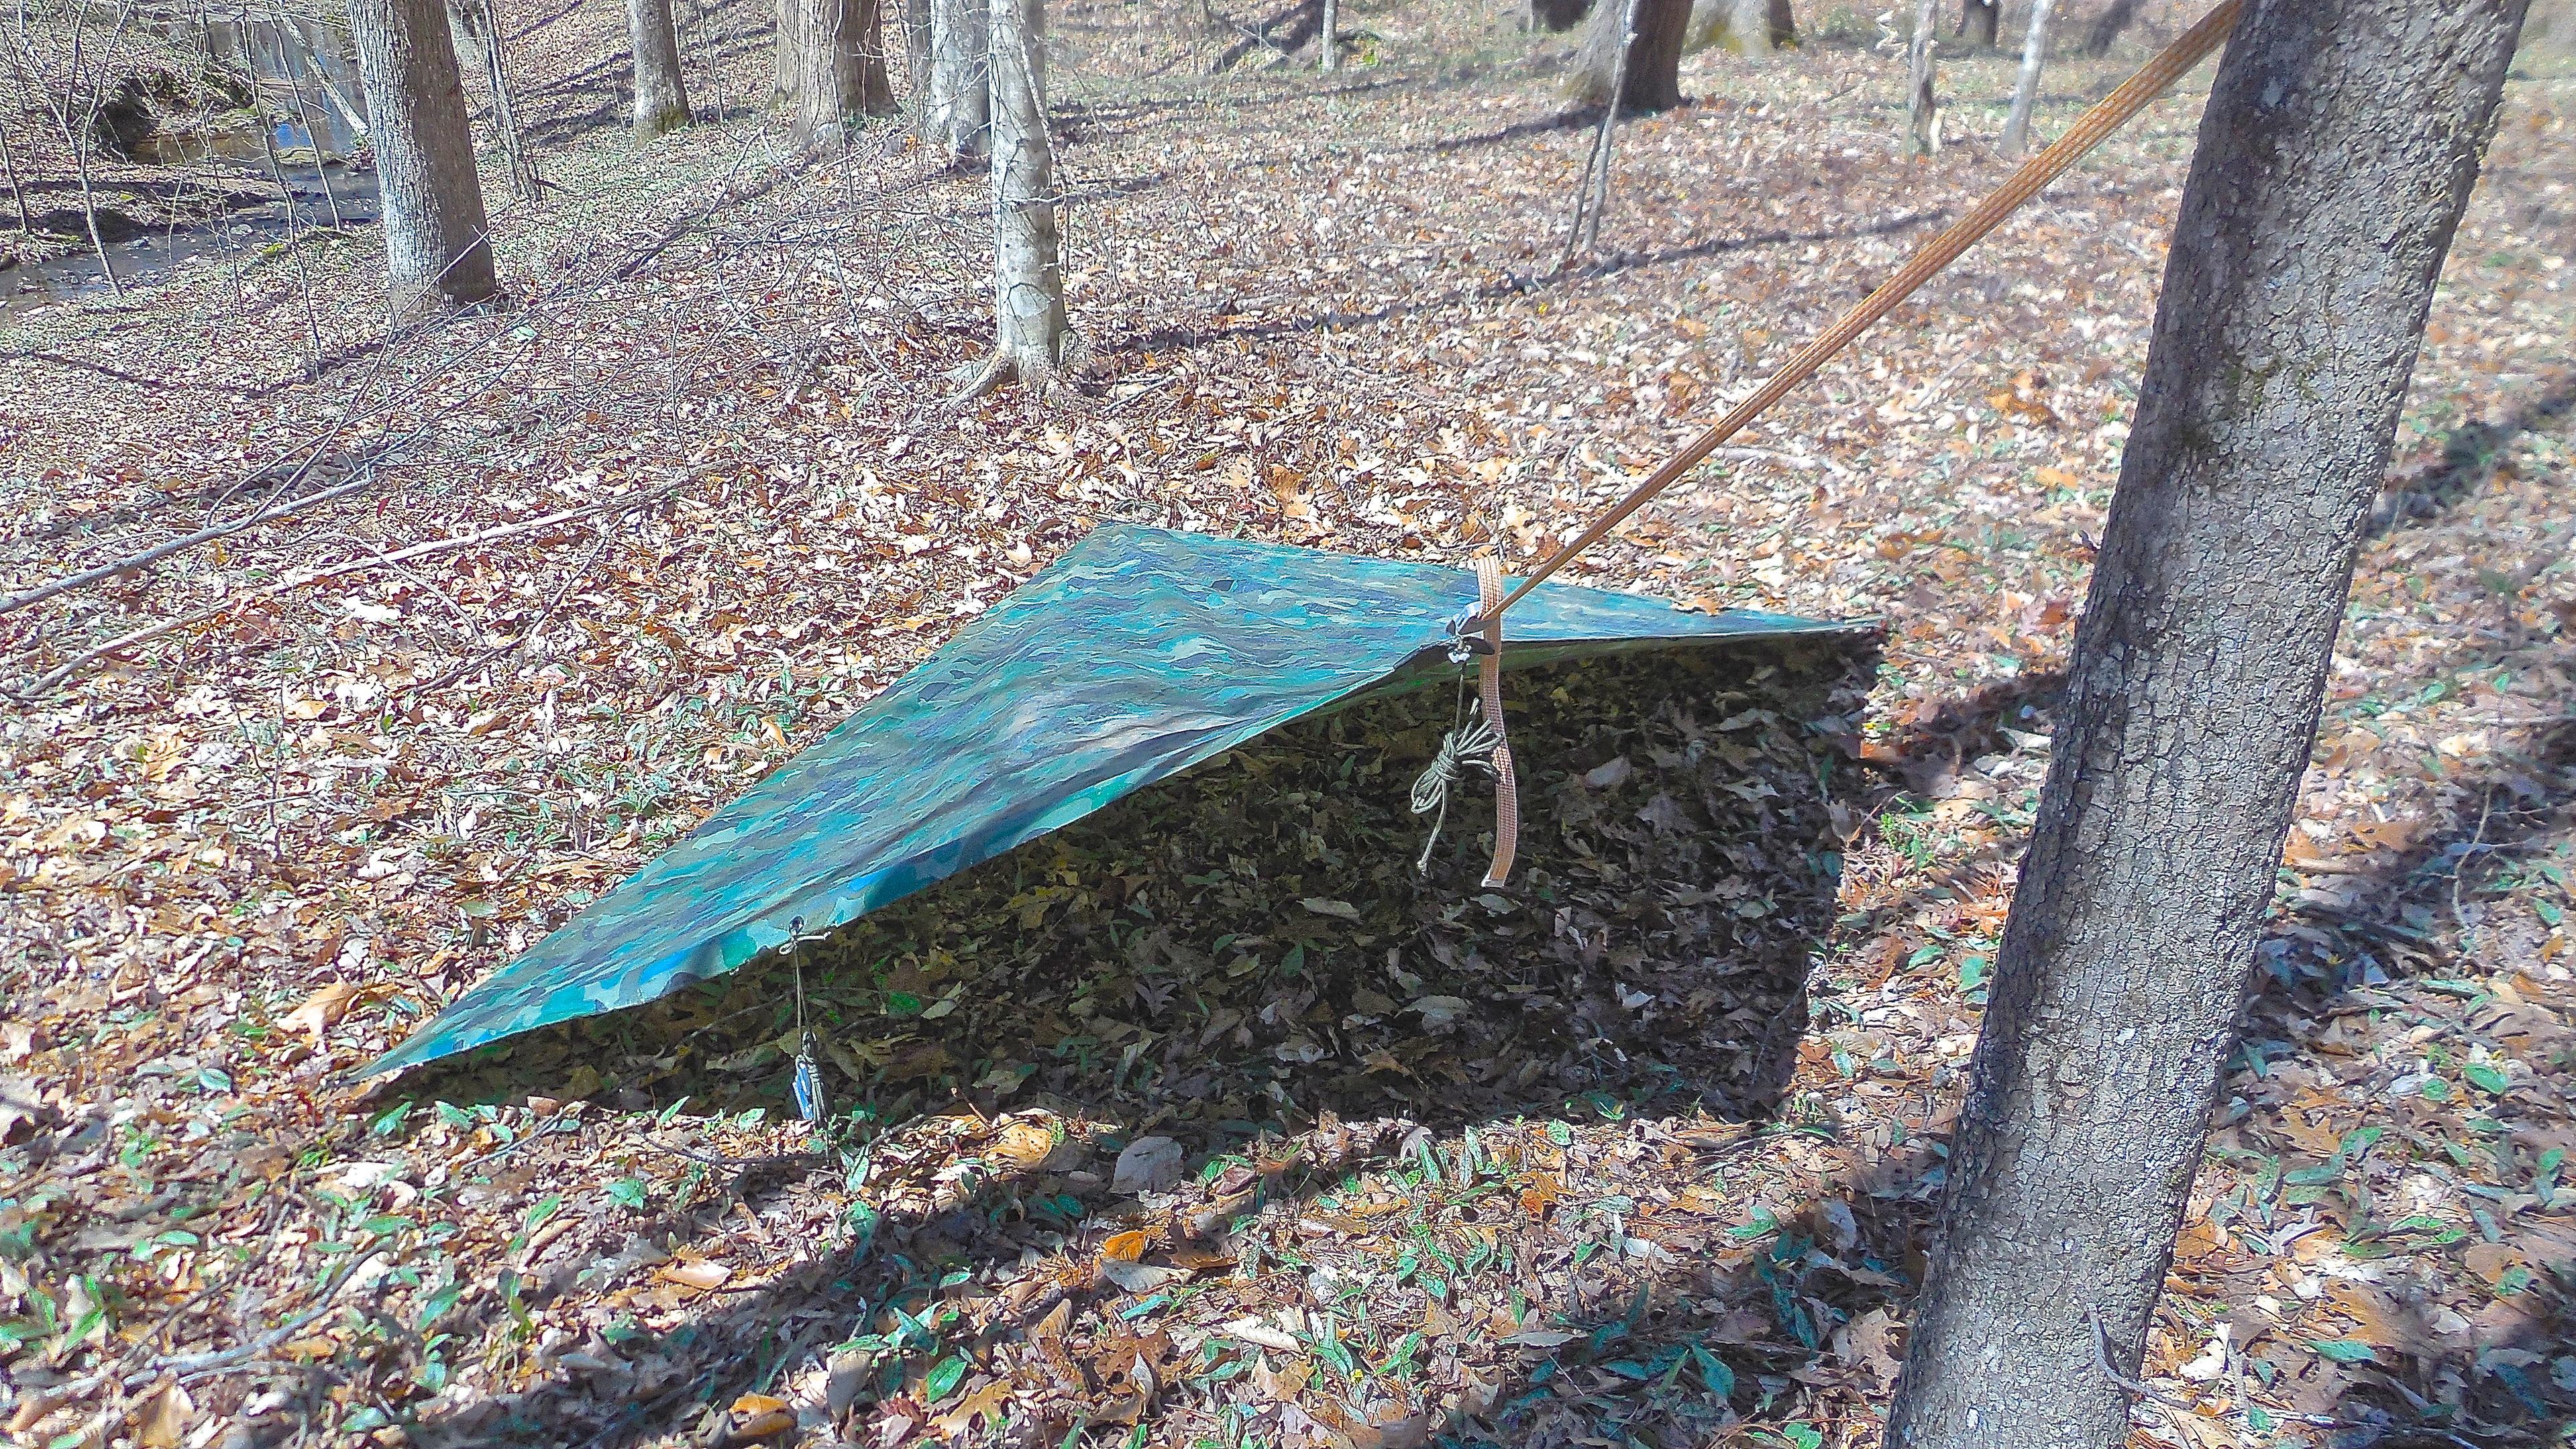 dscn0497-jpg.45754_Decent Rain Proof Tent?_Alternative Housing_Squat the Planet_10:29 AM